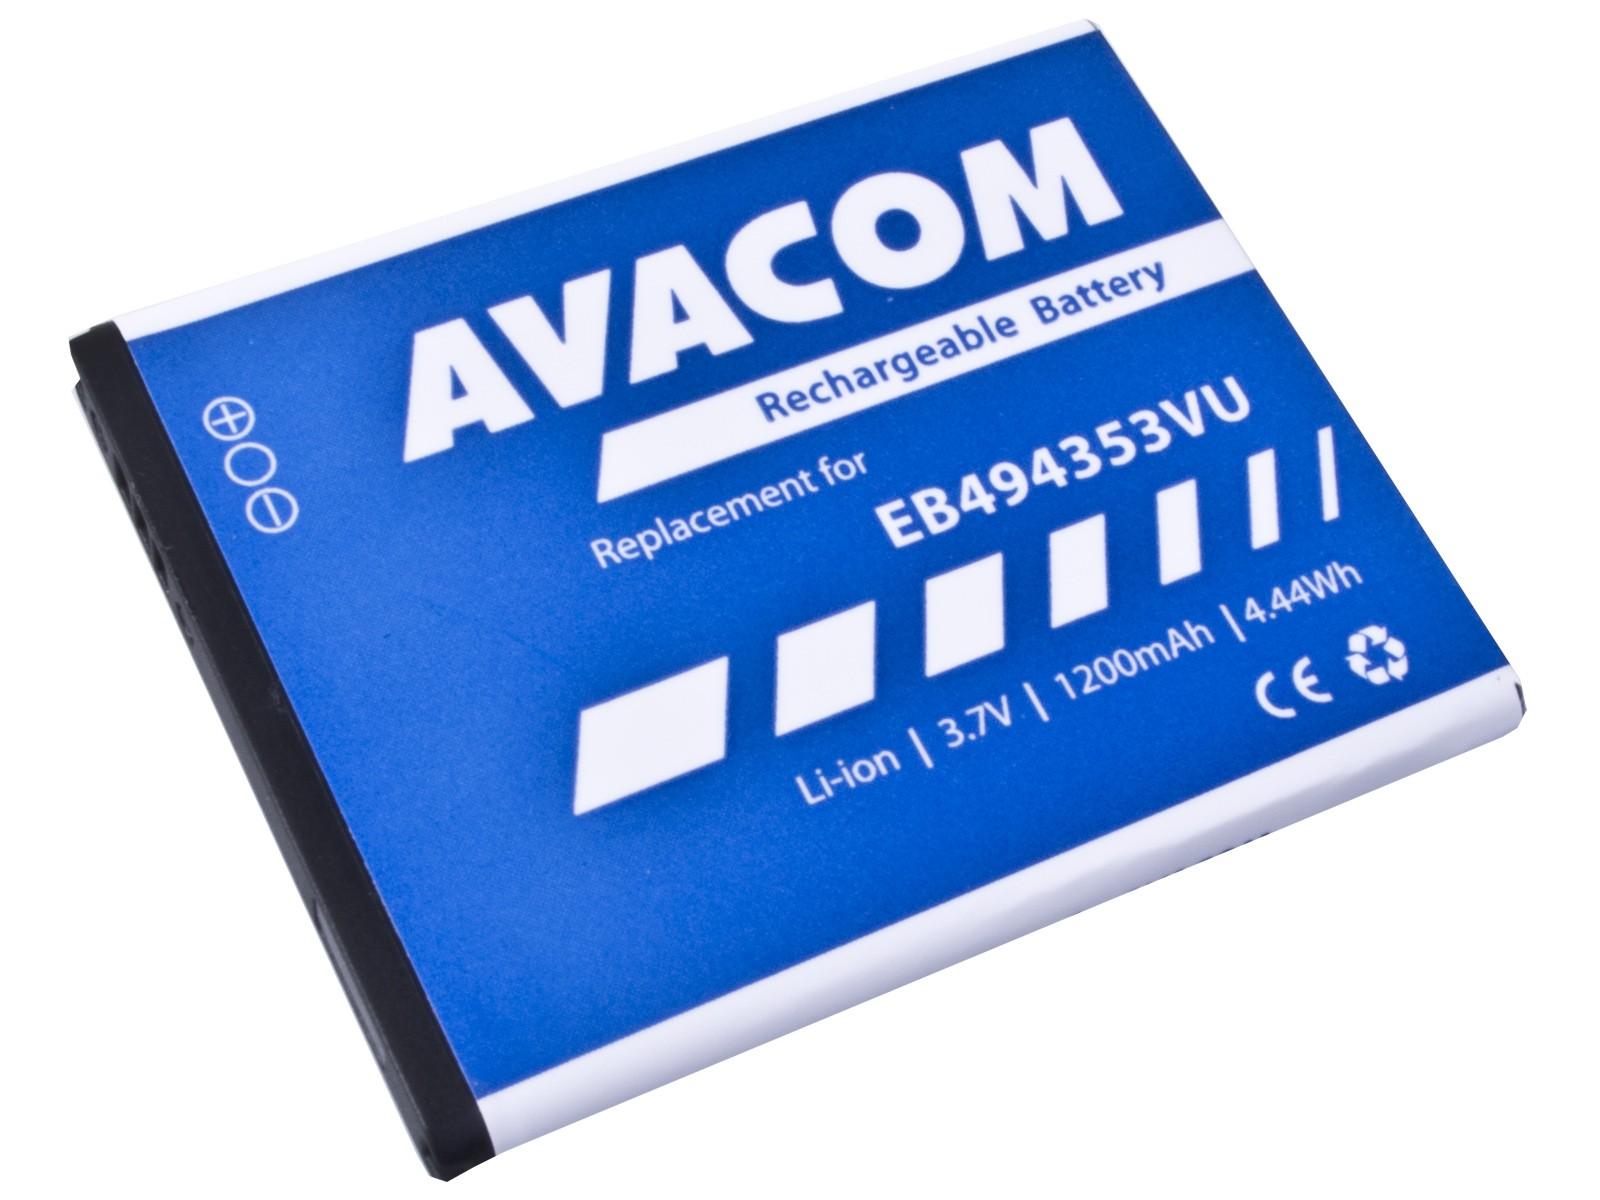 Baterie AVACOM GSSA-5570-S1200A do mobilu Samsung 5570 Galaxy mini Li-Ion 3,7V 1200mAh